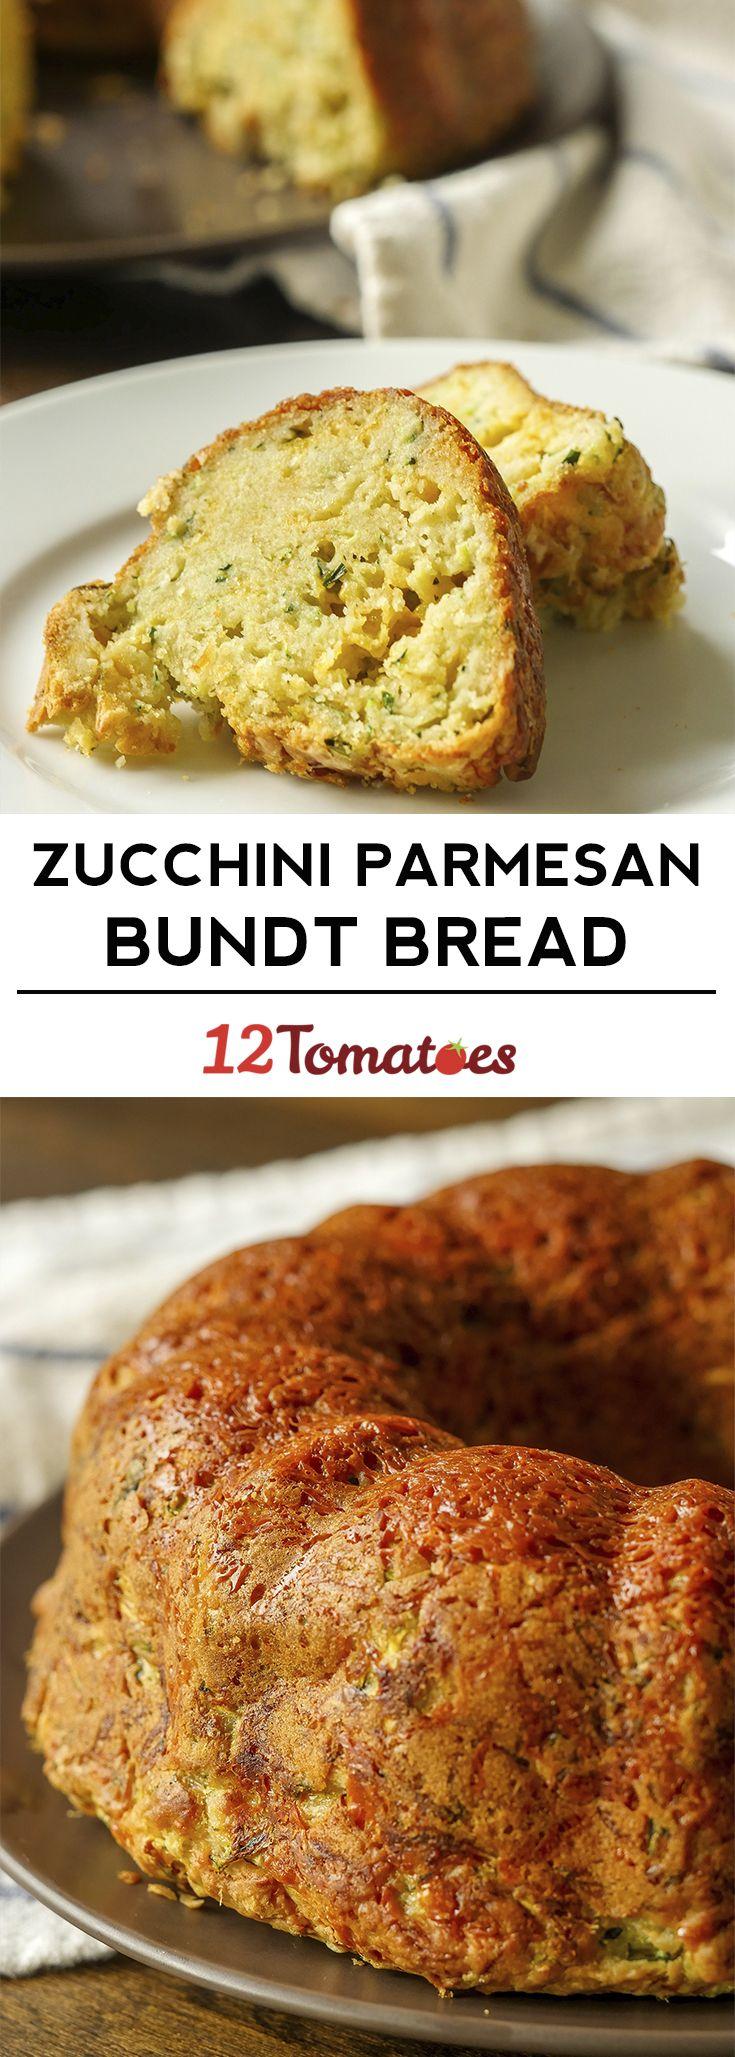 Zucchini Parmesan Bundt Bread